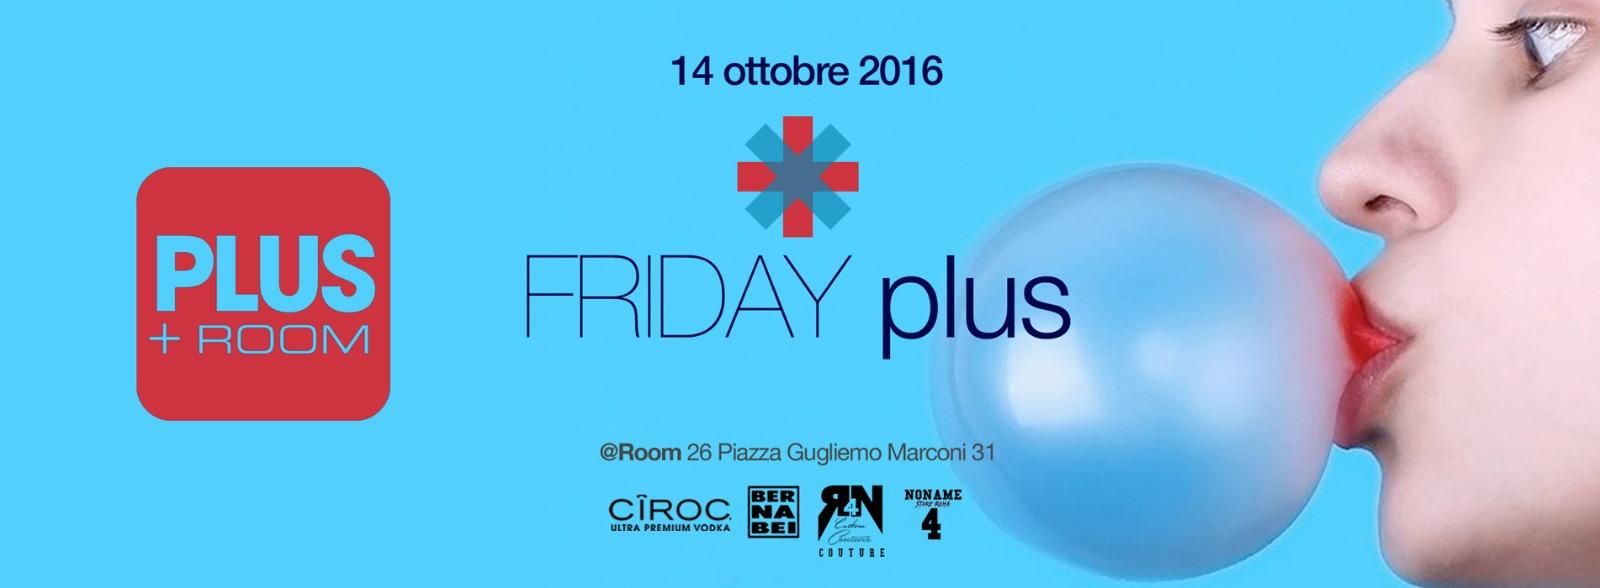 Room 26 serata Vintage Roma venerdì 14 ottobre 2016